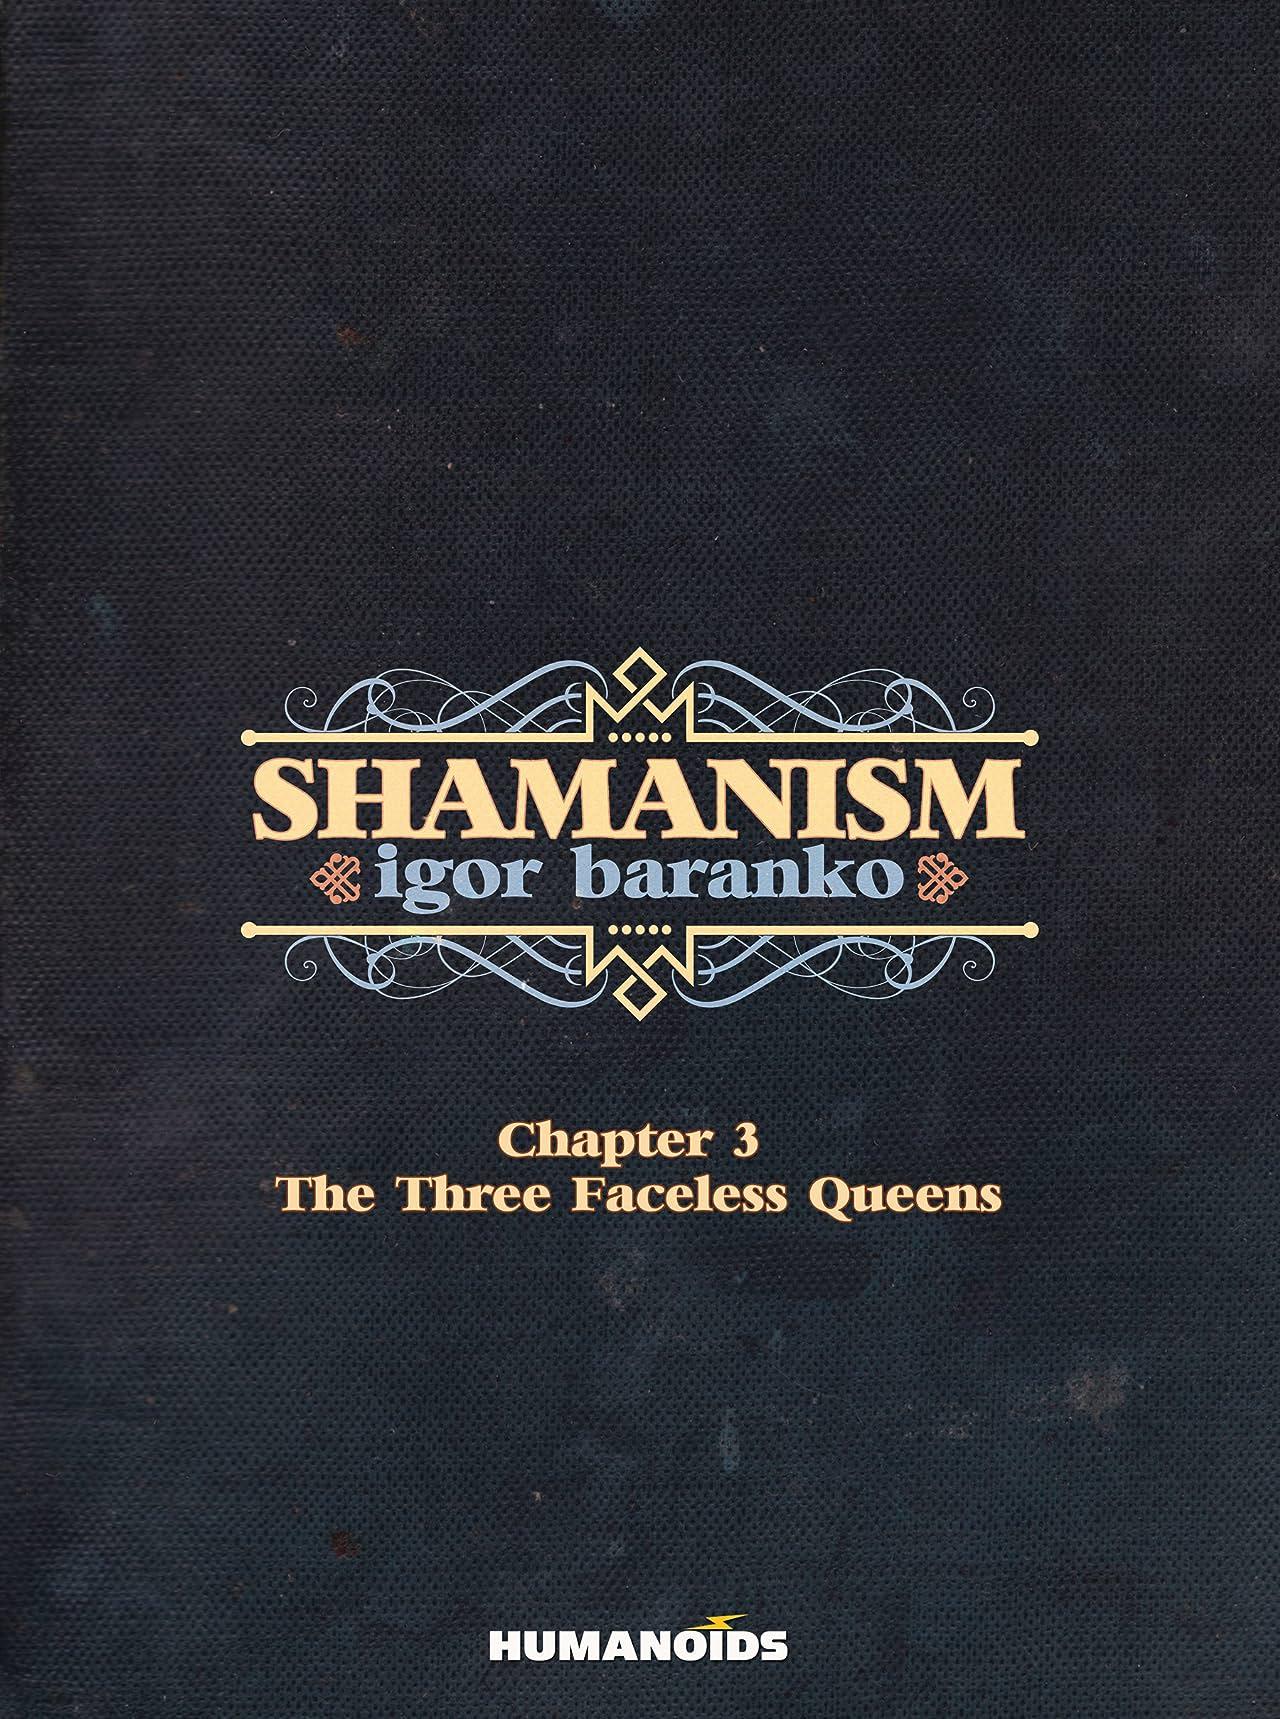 Shamanism Vol. 3